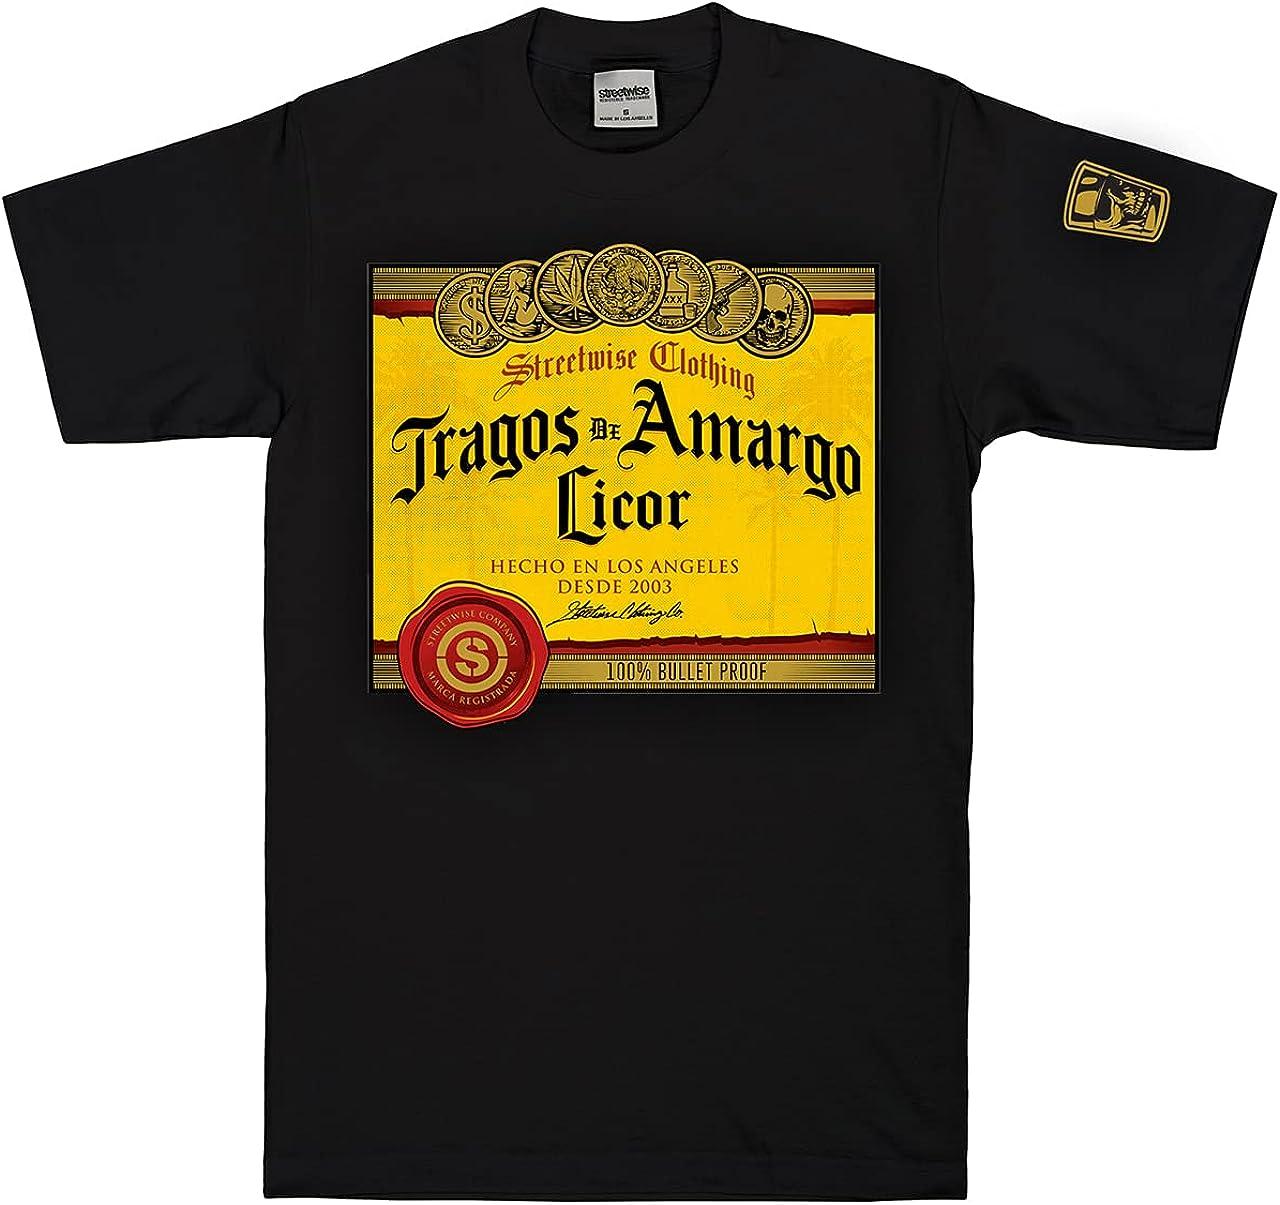 Streetwise gift Tragos Amargos T-Shirt Ranking TOP5